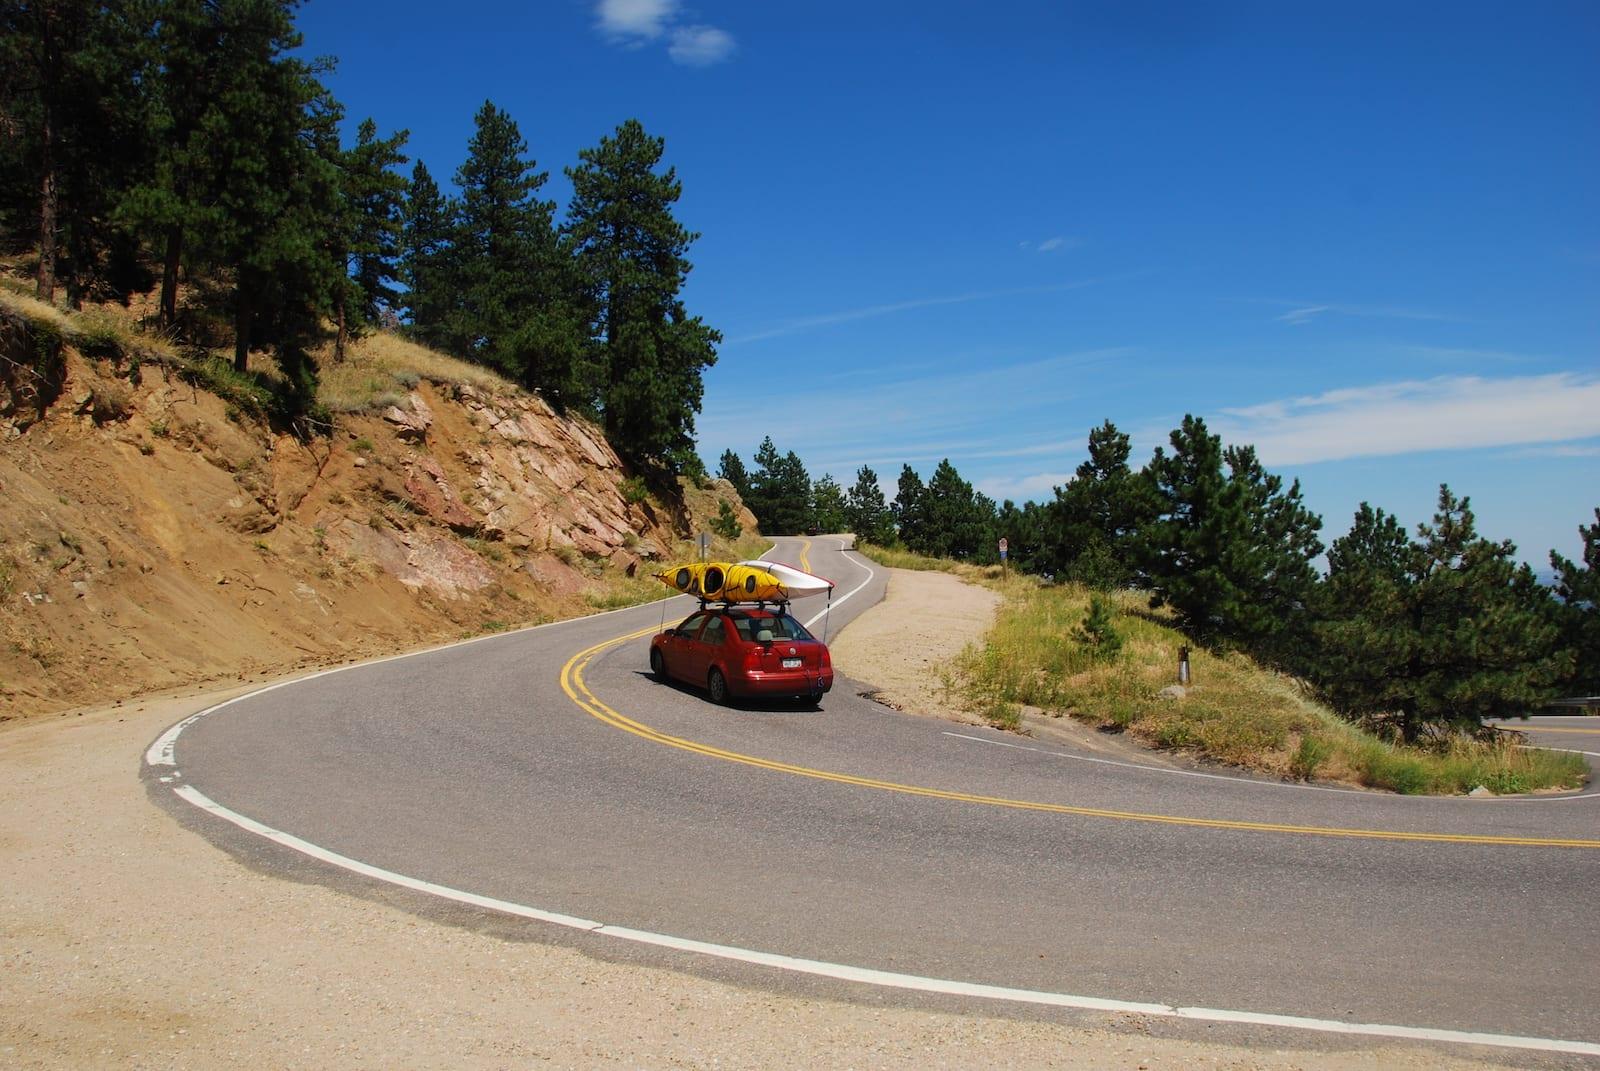 Headed to Gross Reservoir, CO